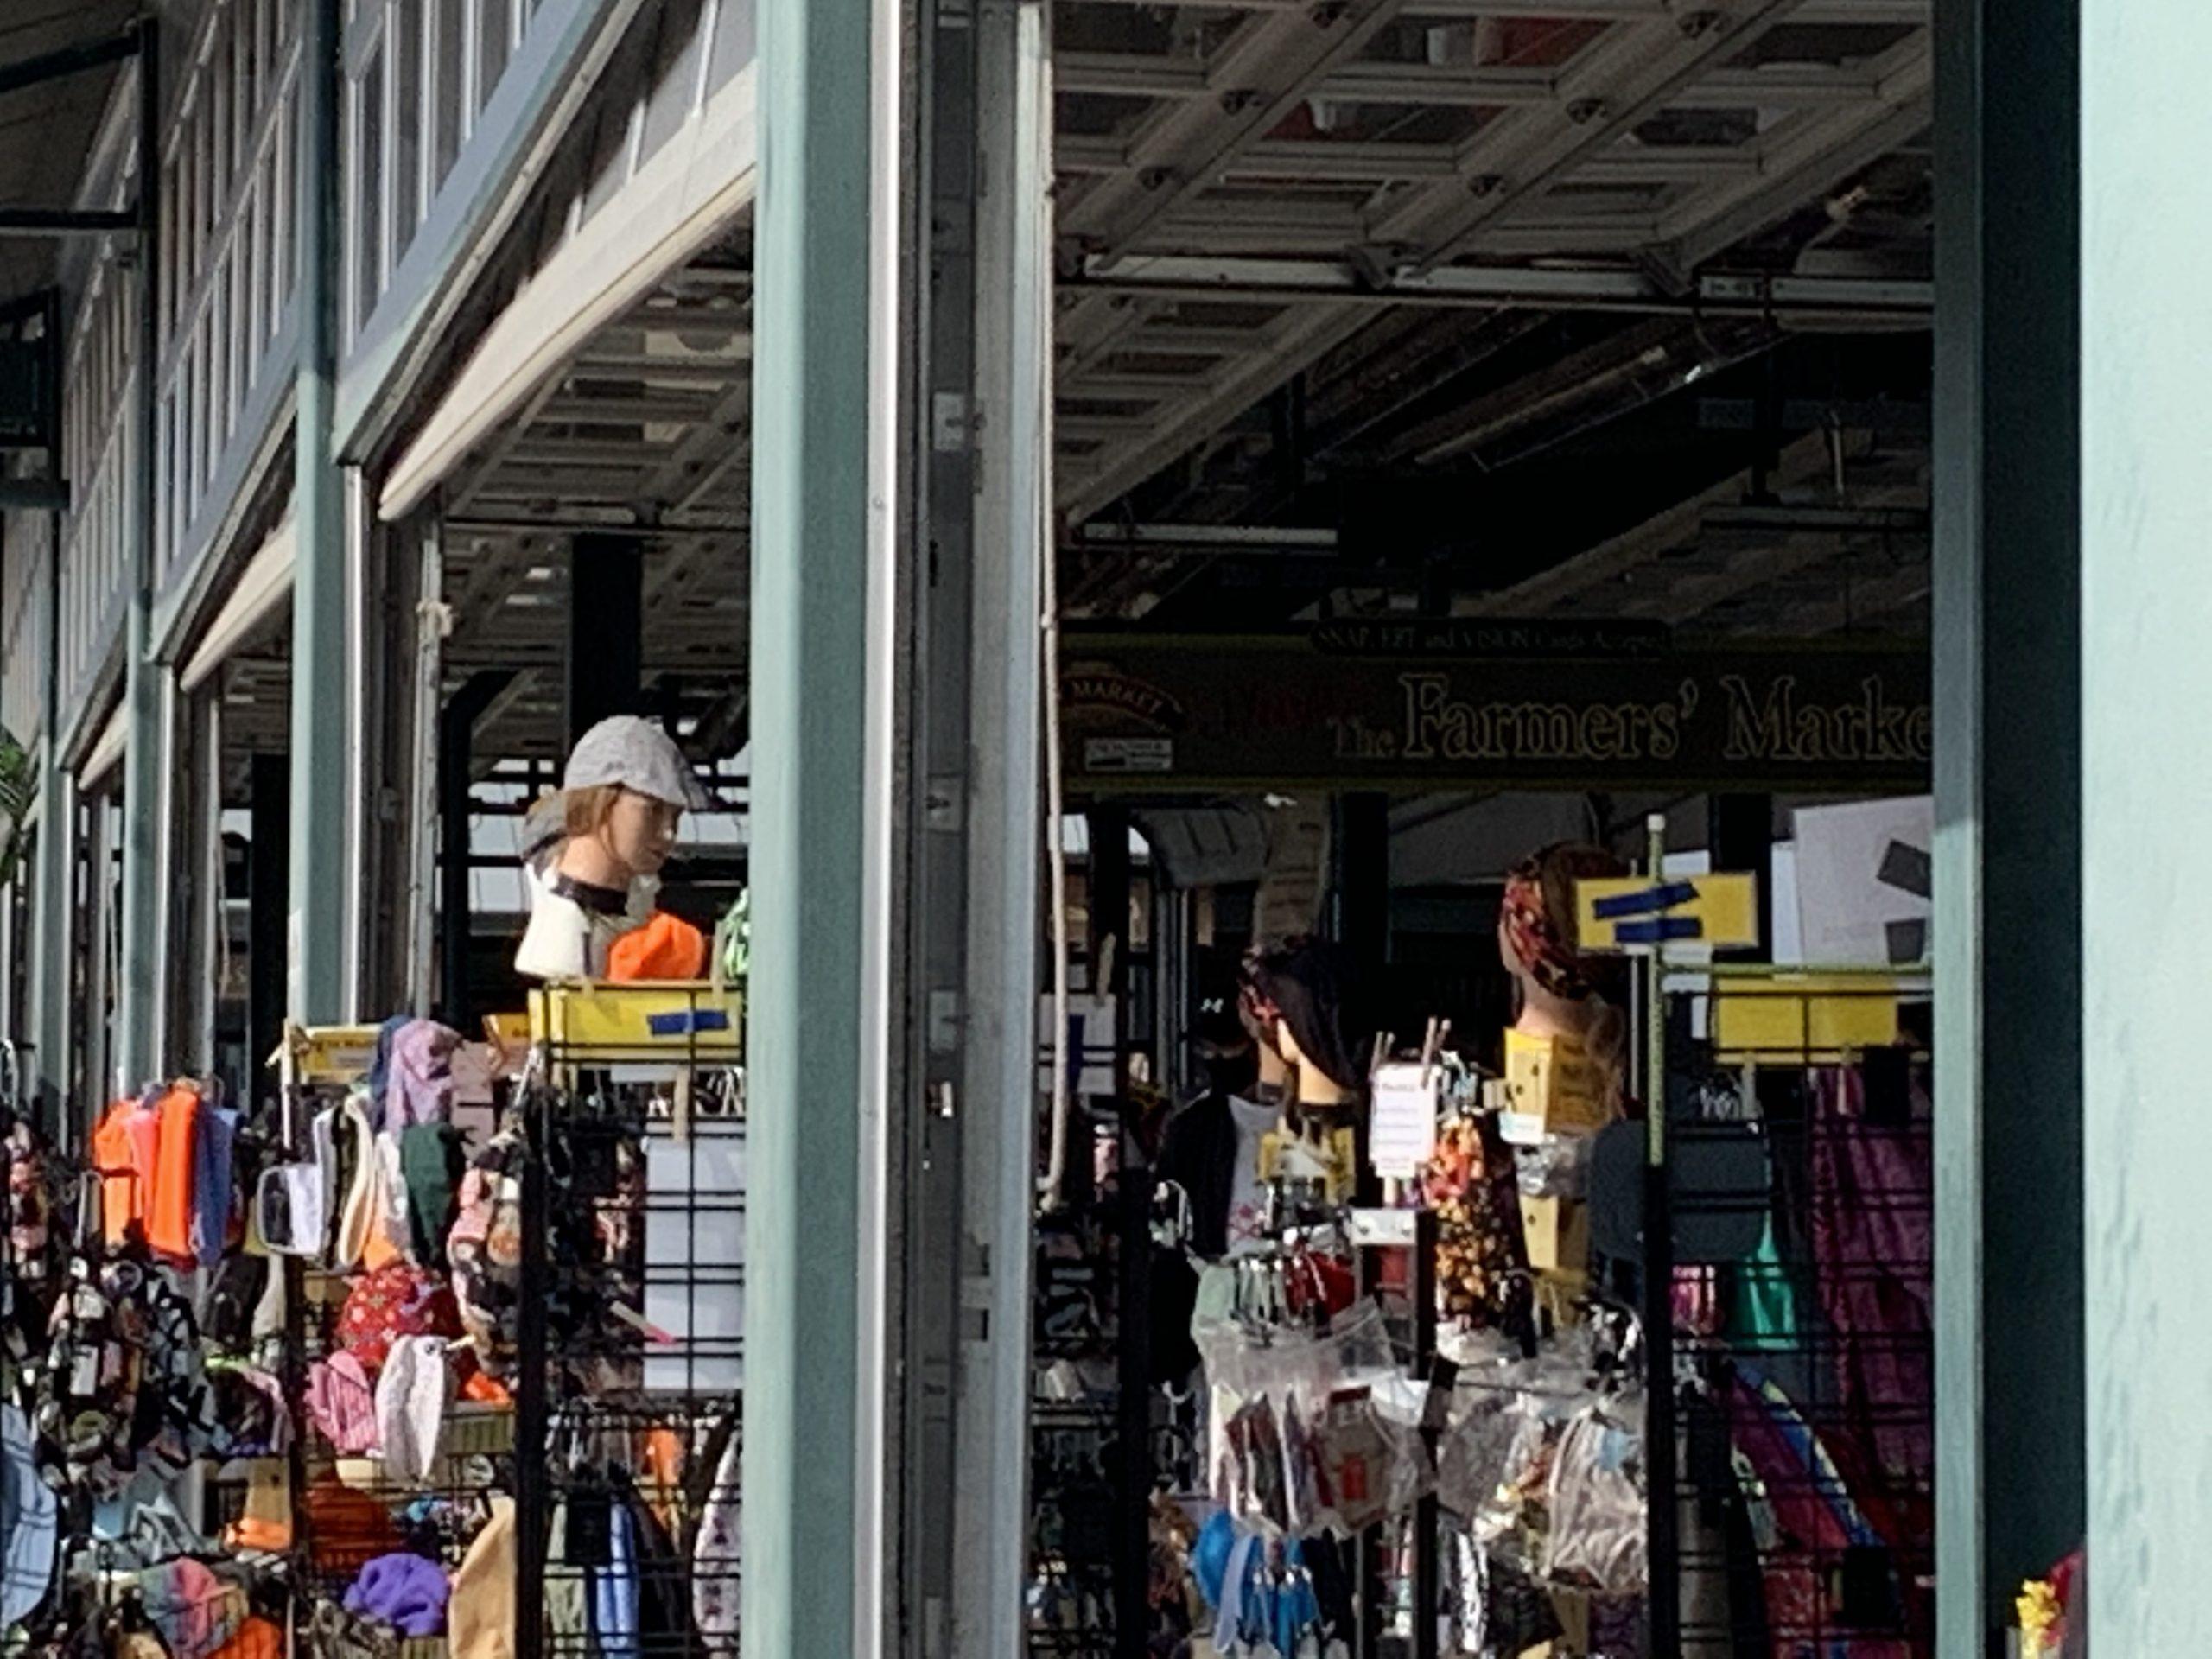 Kansas City City Market Farmers Market Pavilion 1020